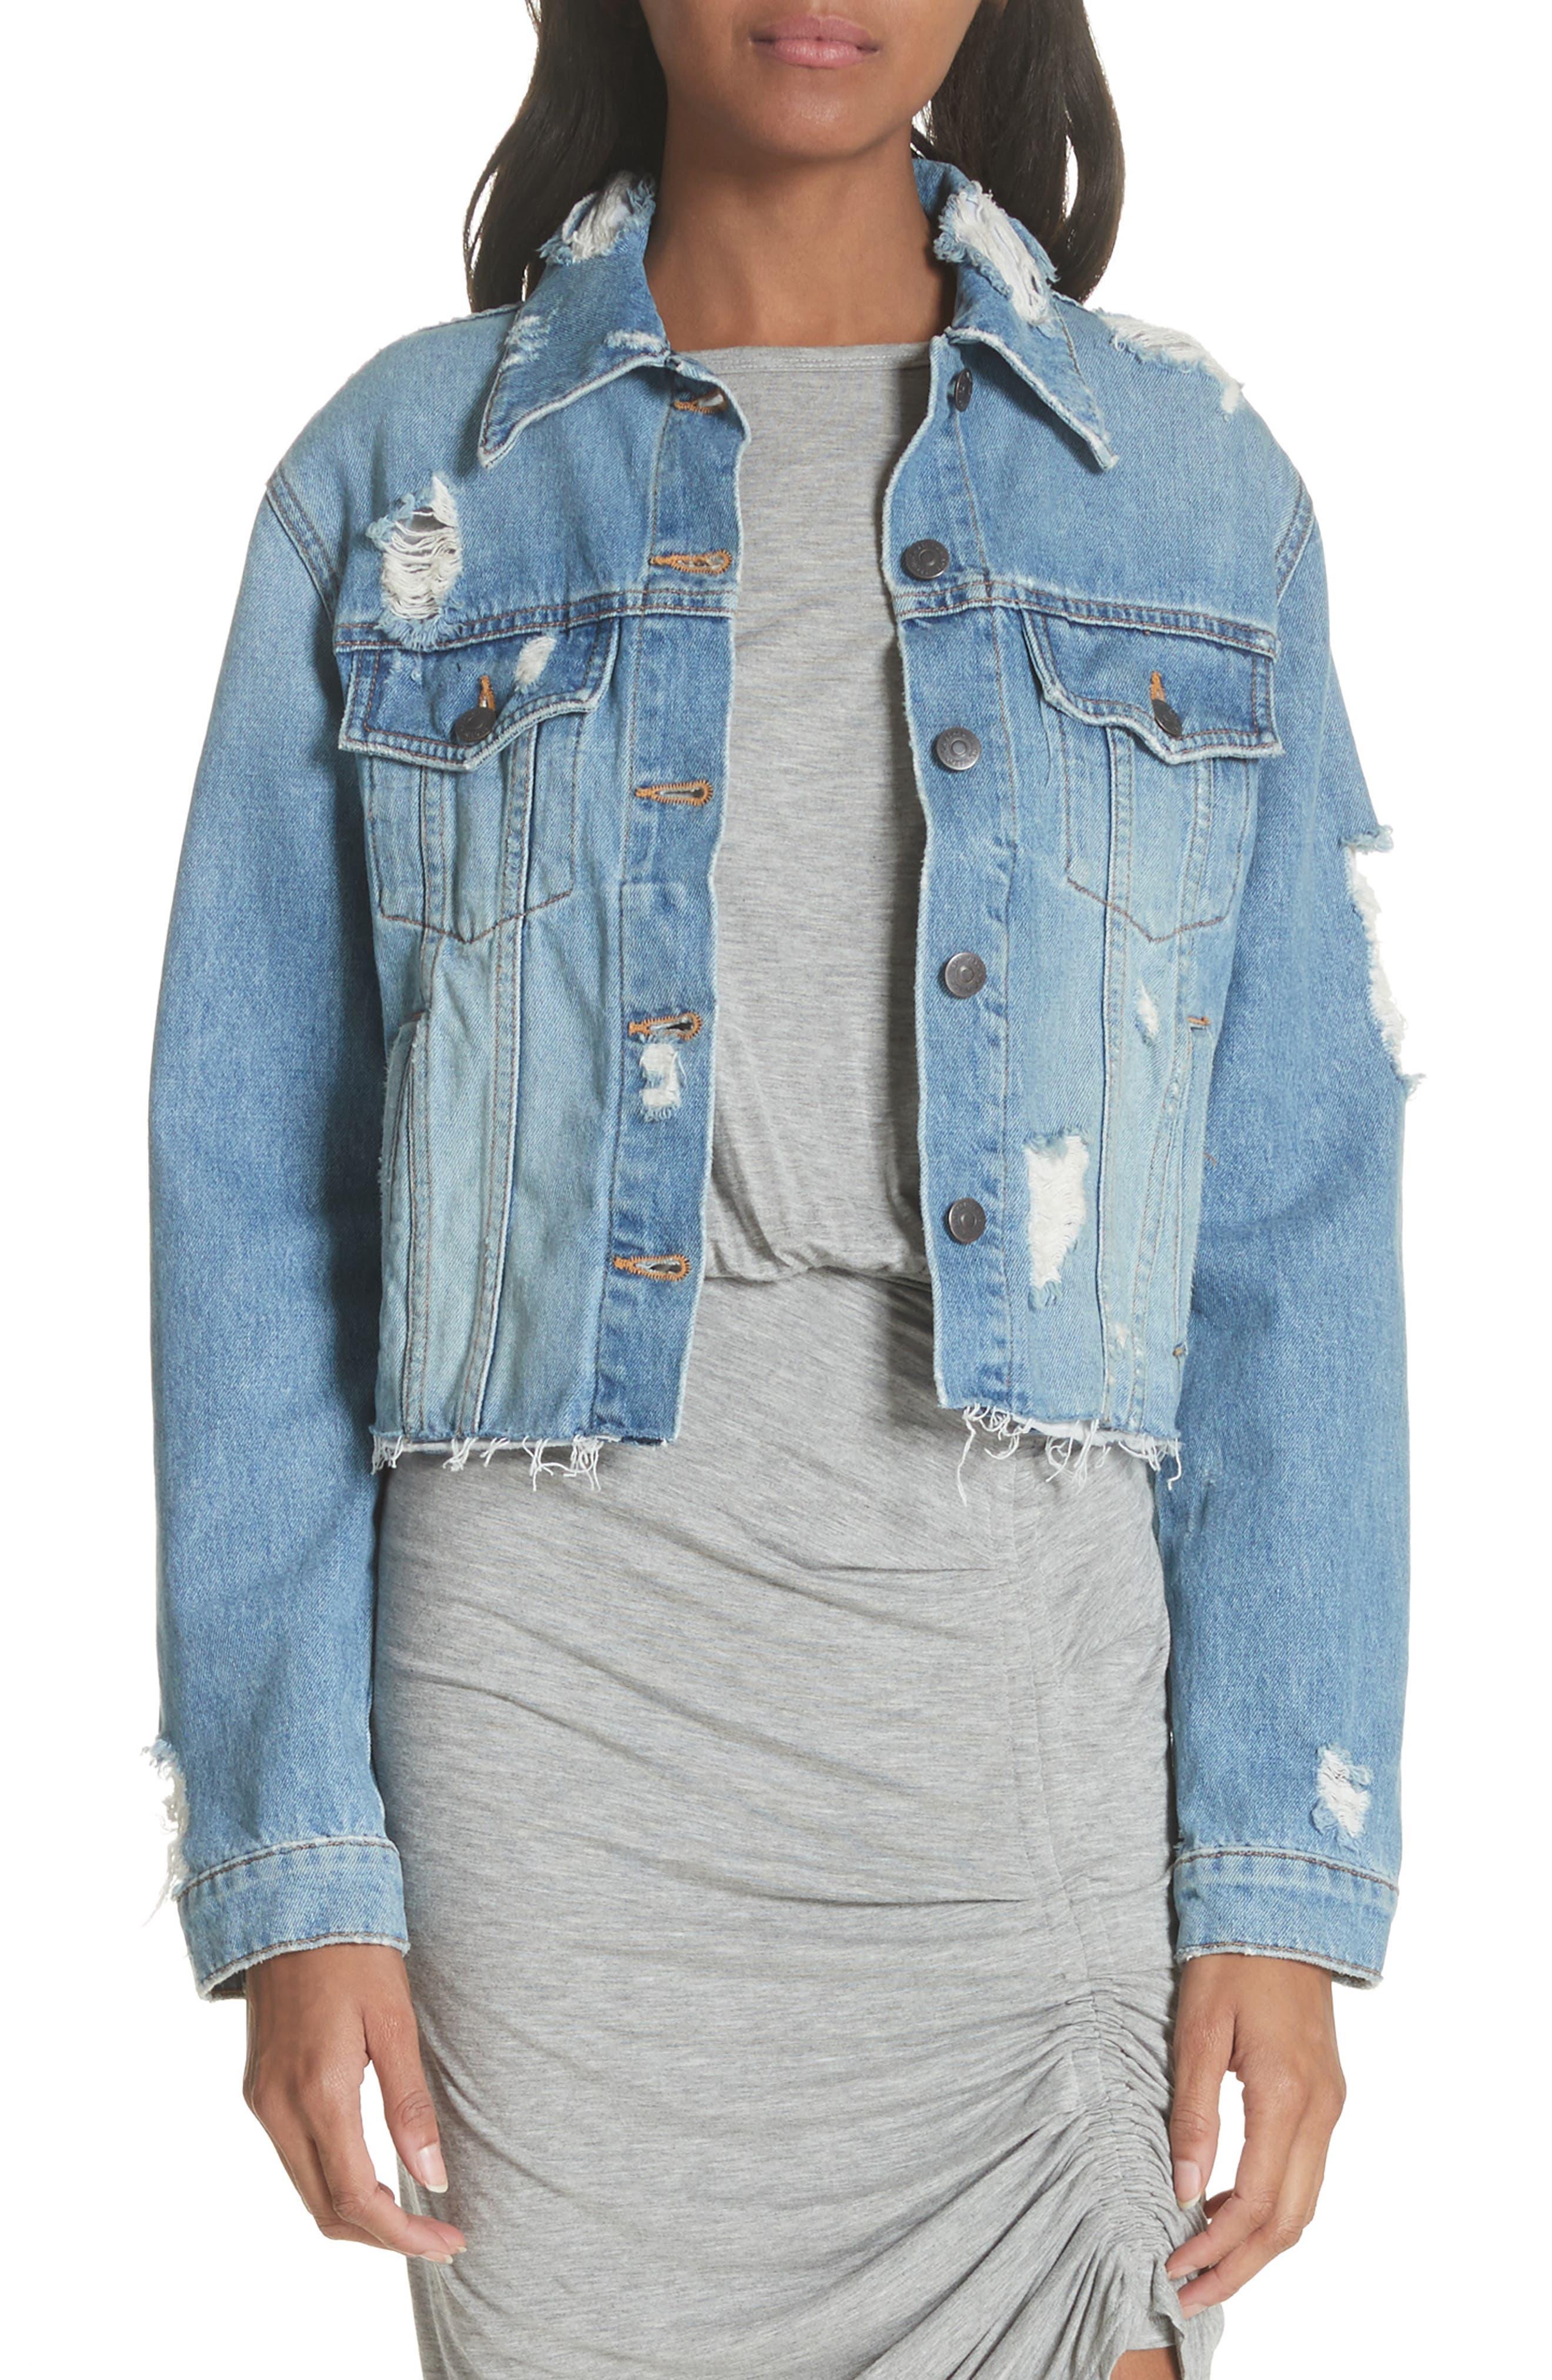 Cara Distressed Floral Denim Cutoff Jacket in Distressed Denim